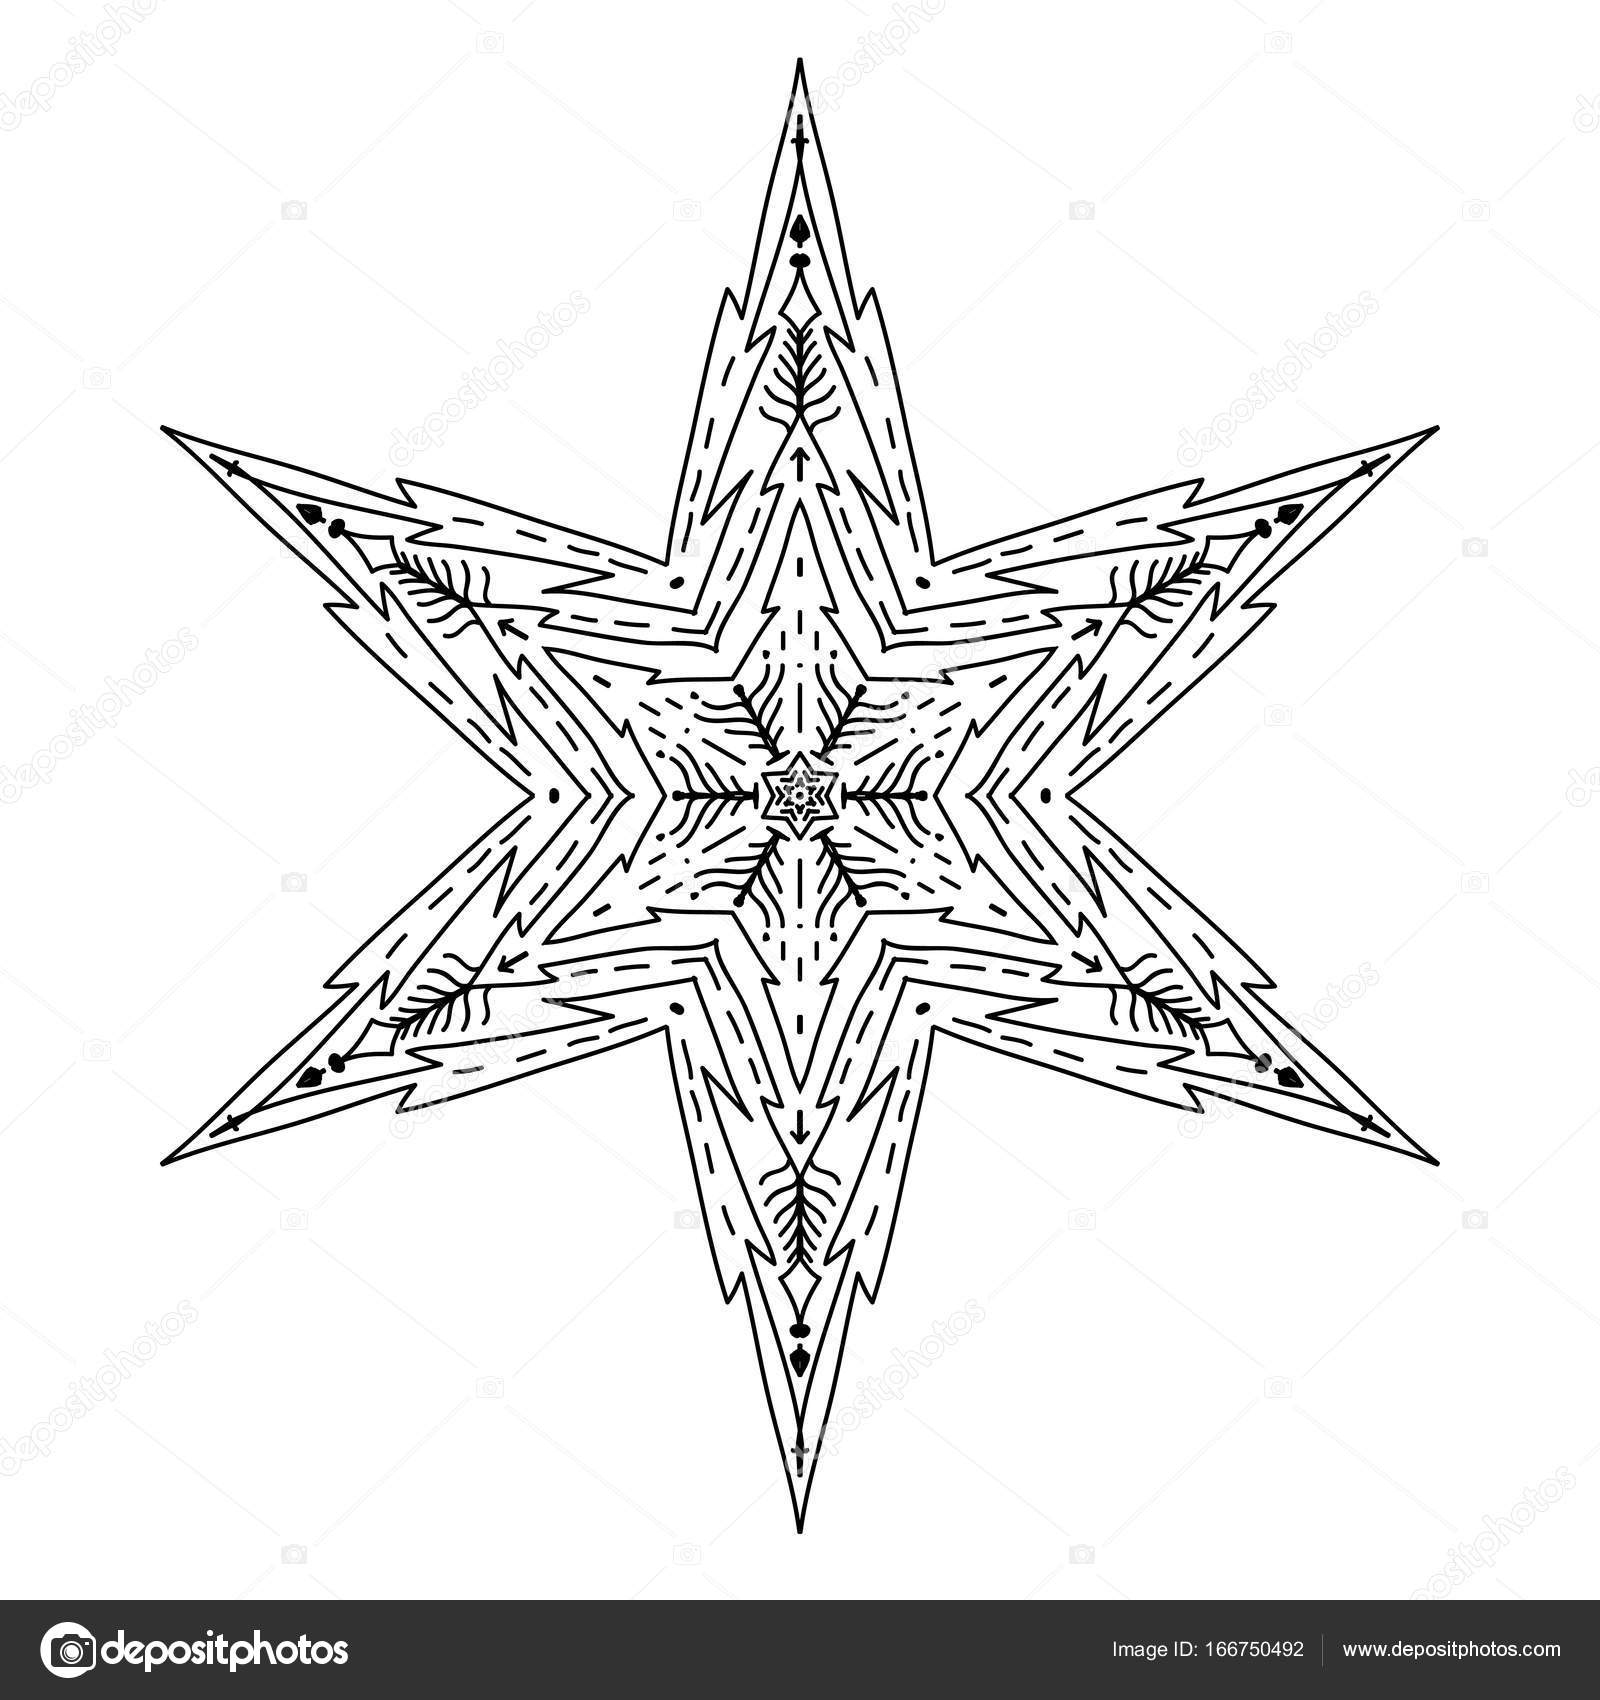 Sterne im dekorativen Stil. Lager Linie Vektor-illustration ...